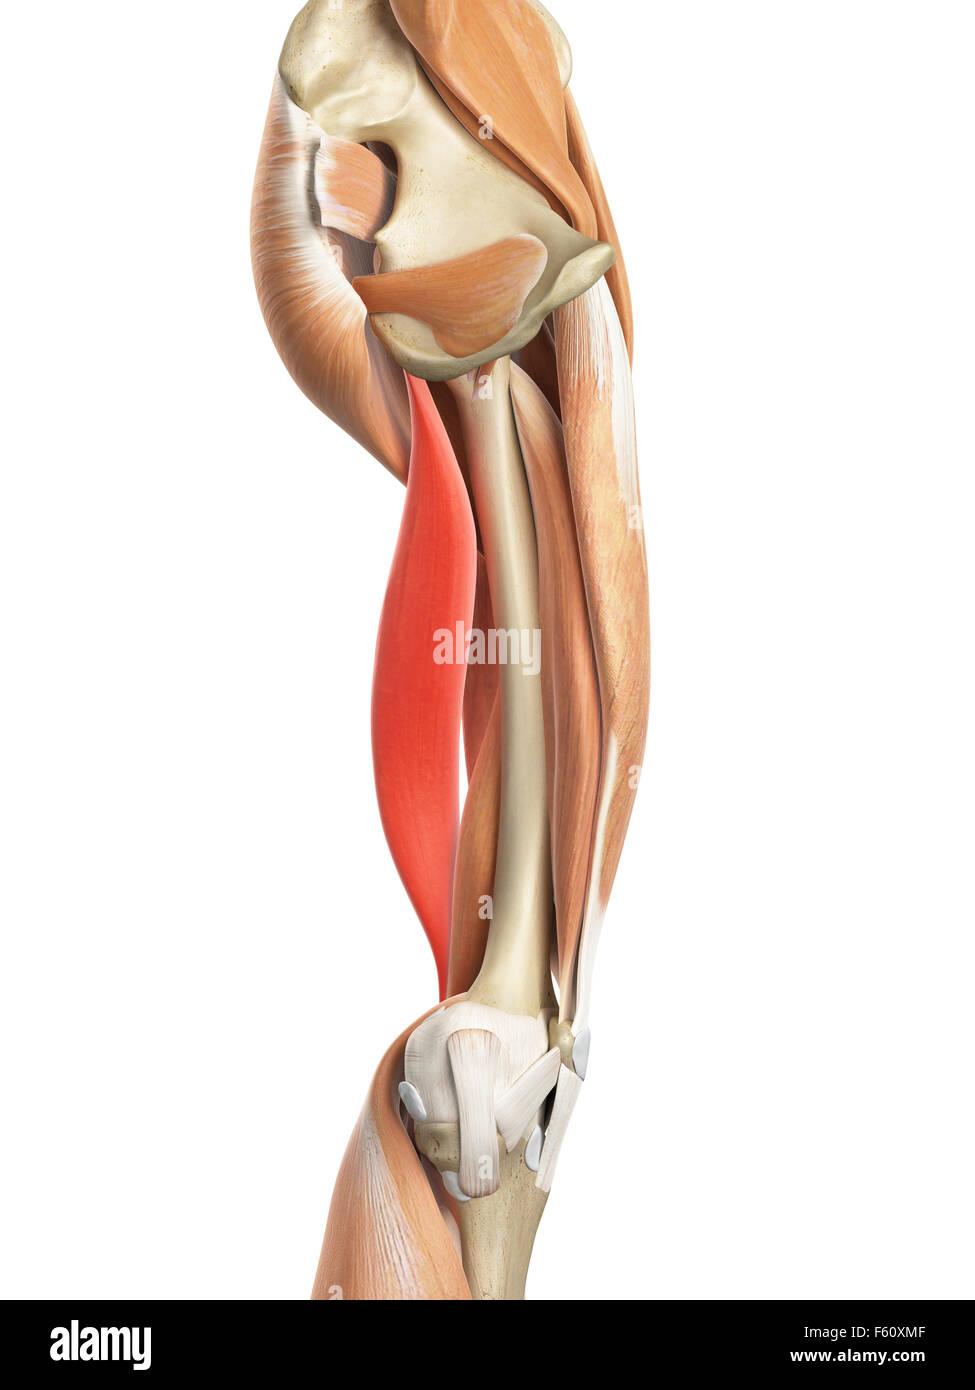 Leg Biceps Stockfotos & Leg Biceps Bilder - Alamy